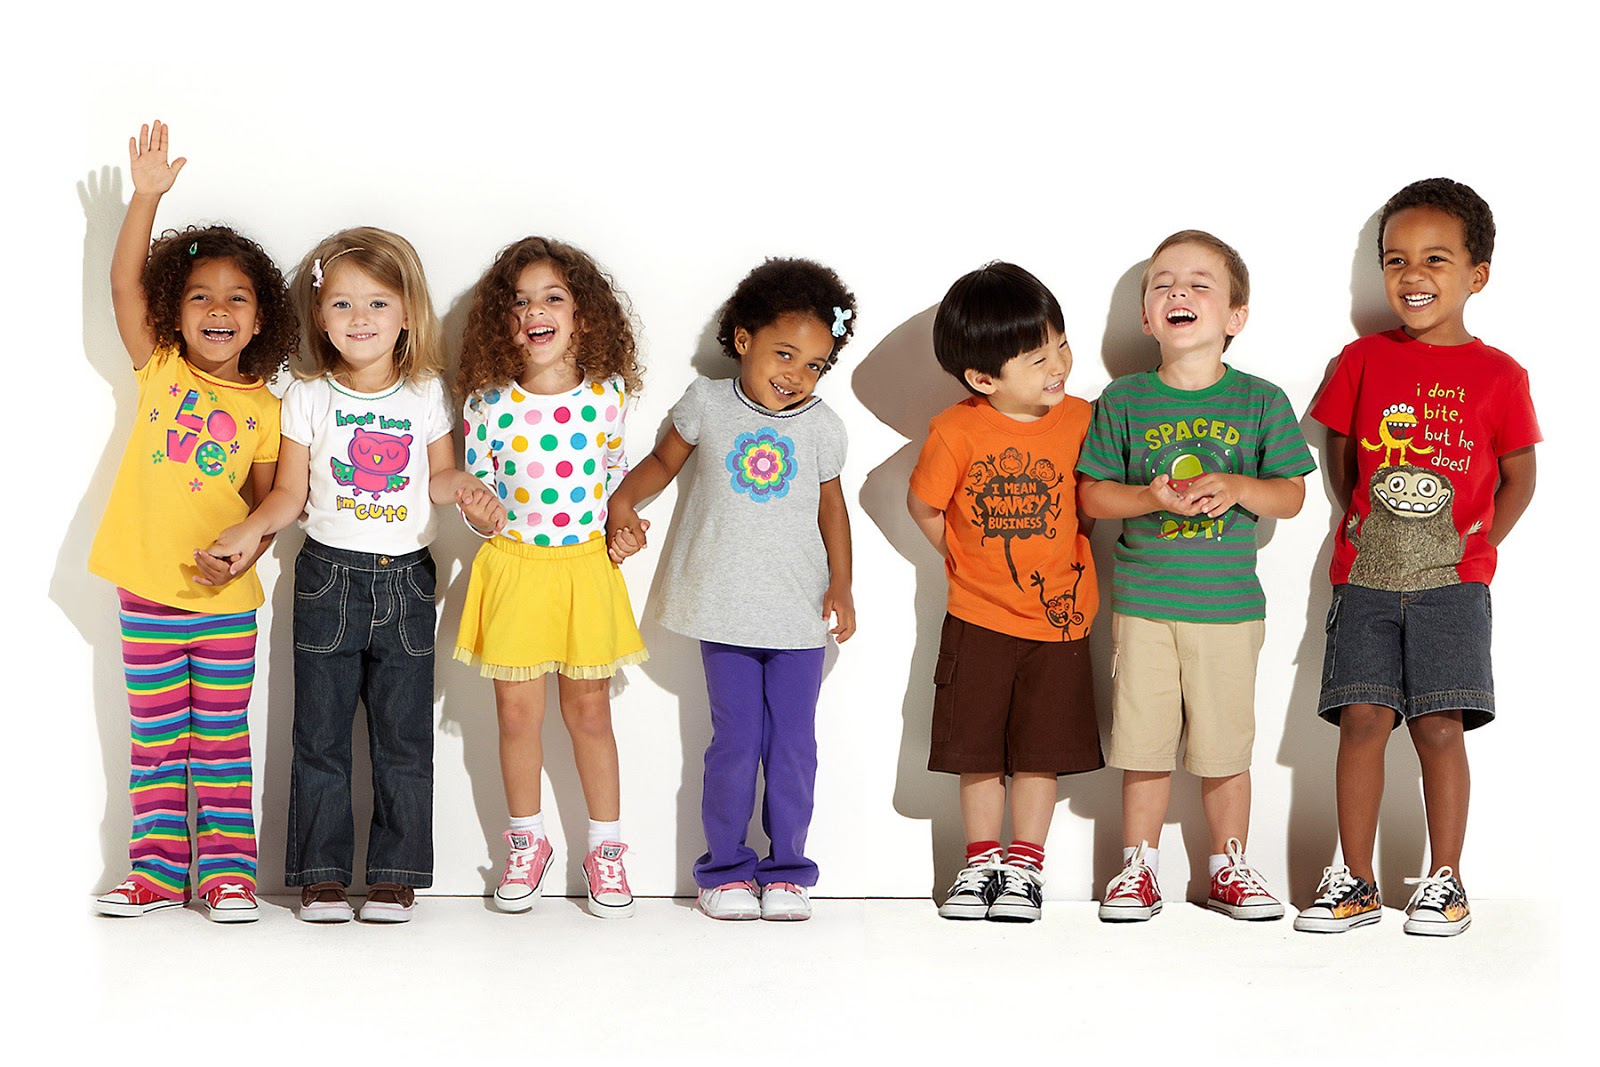 Relevant children s ministry